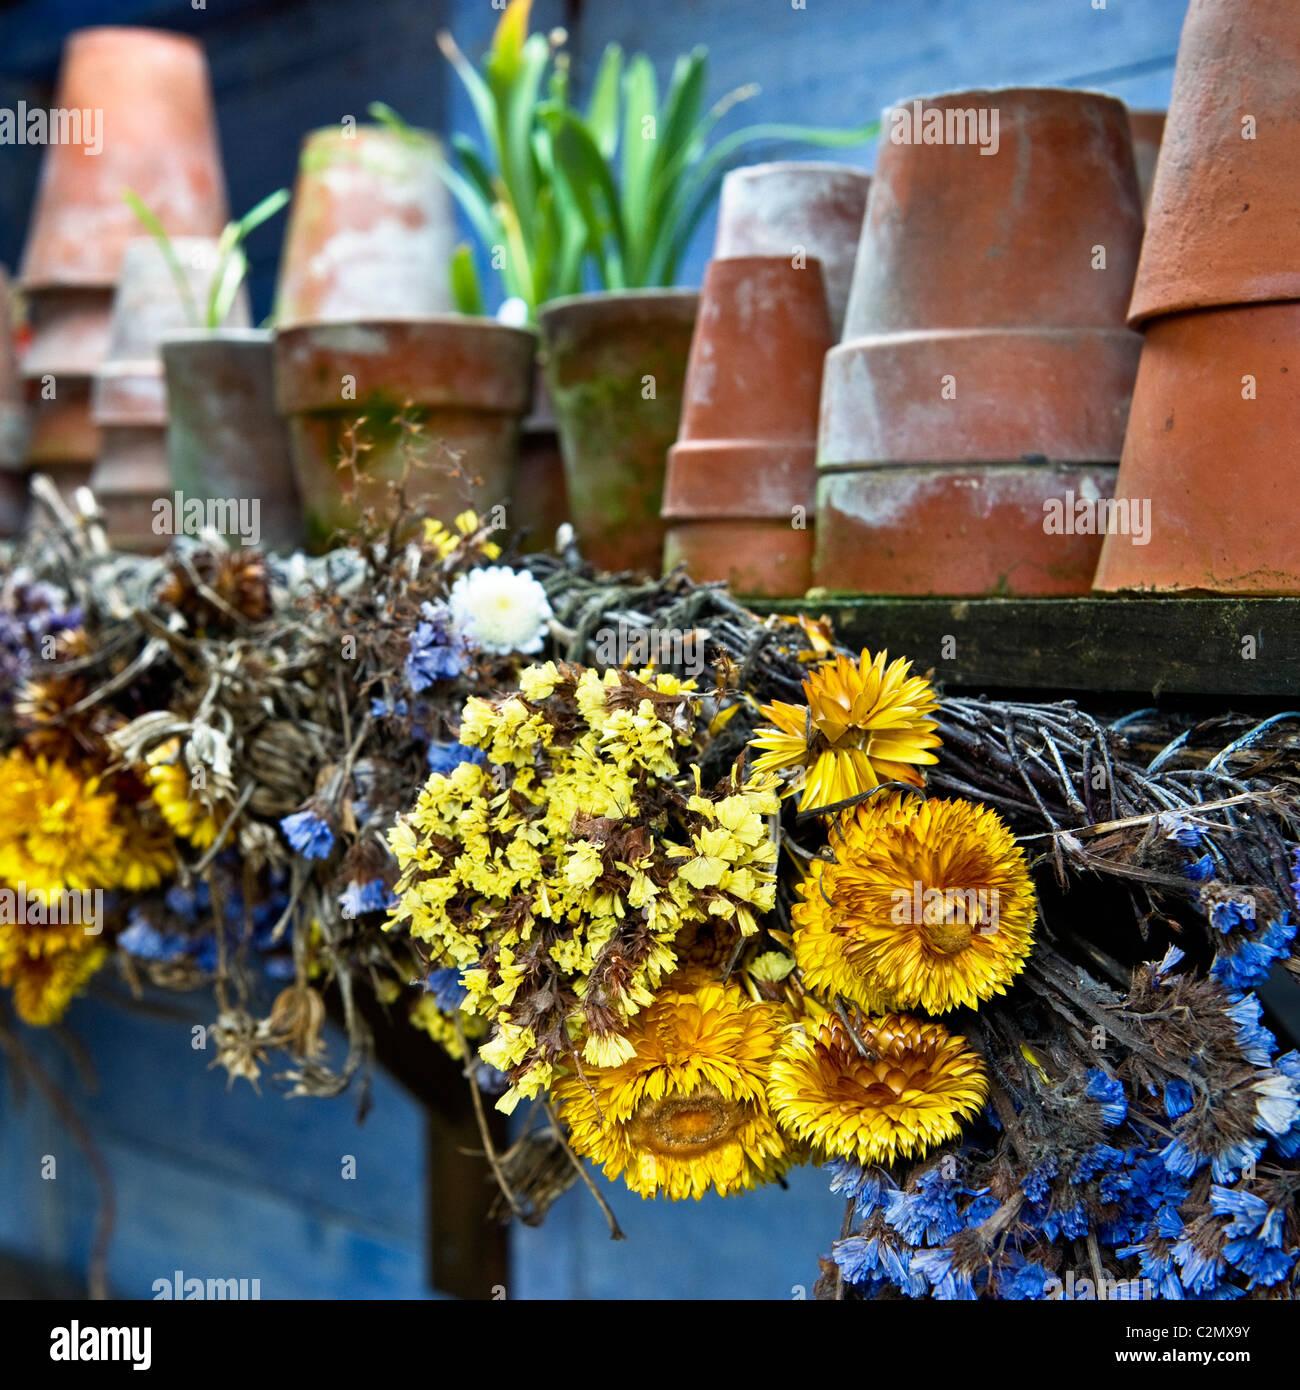 Getrocknete Blumen in alten Potting Shed Stockbild